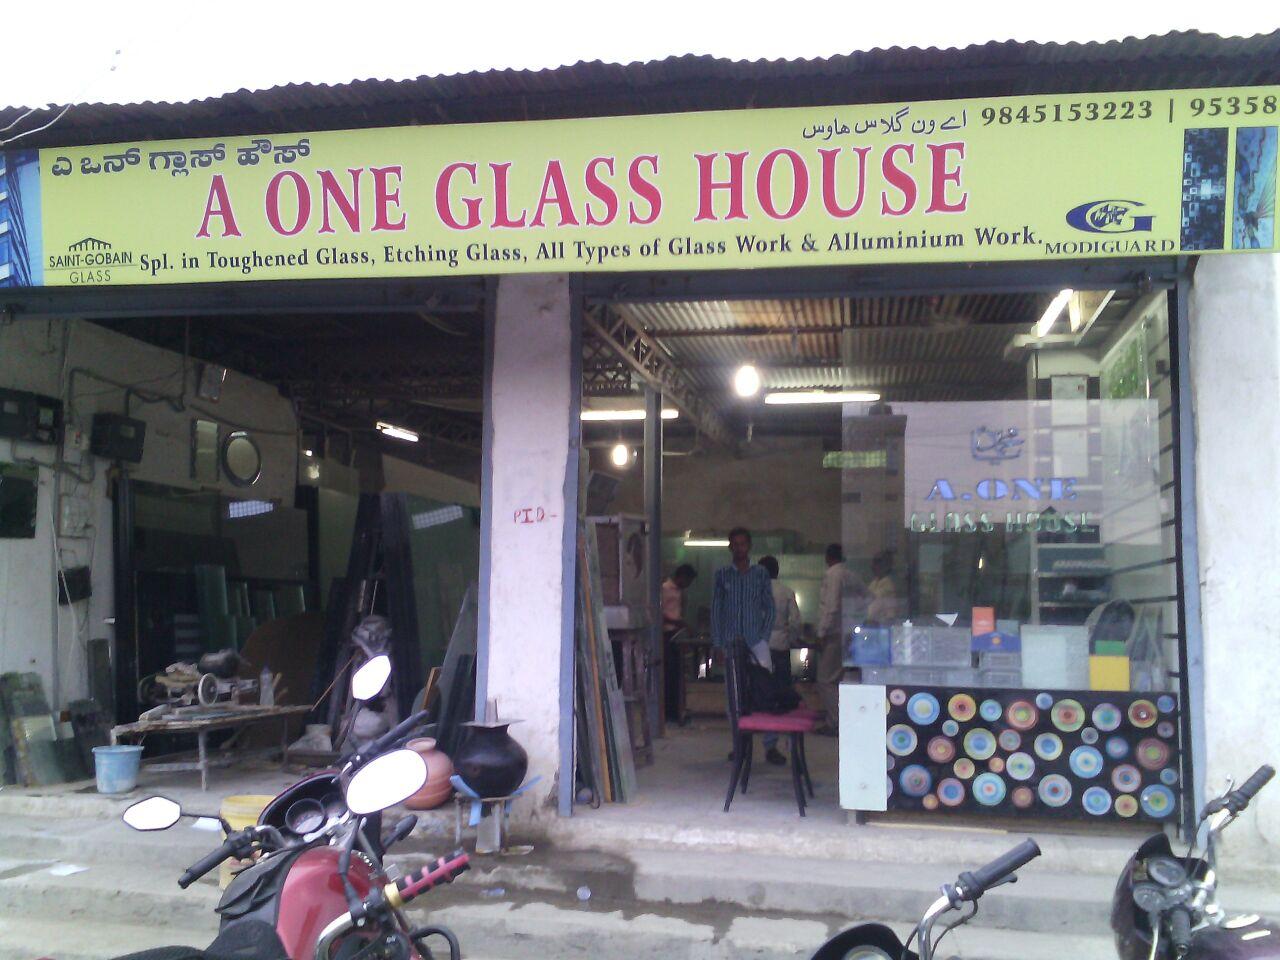 A-ONE Glass House